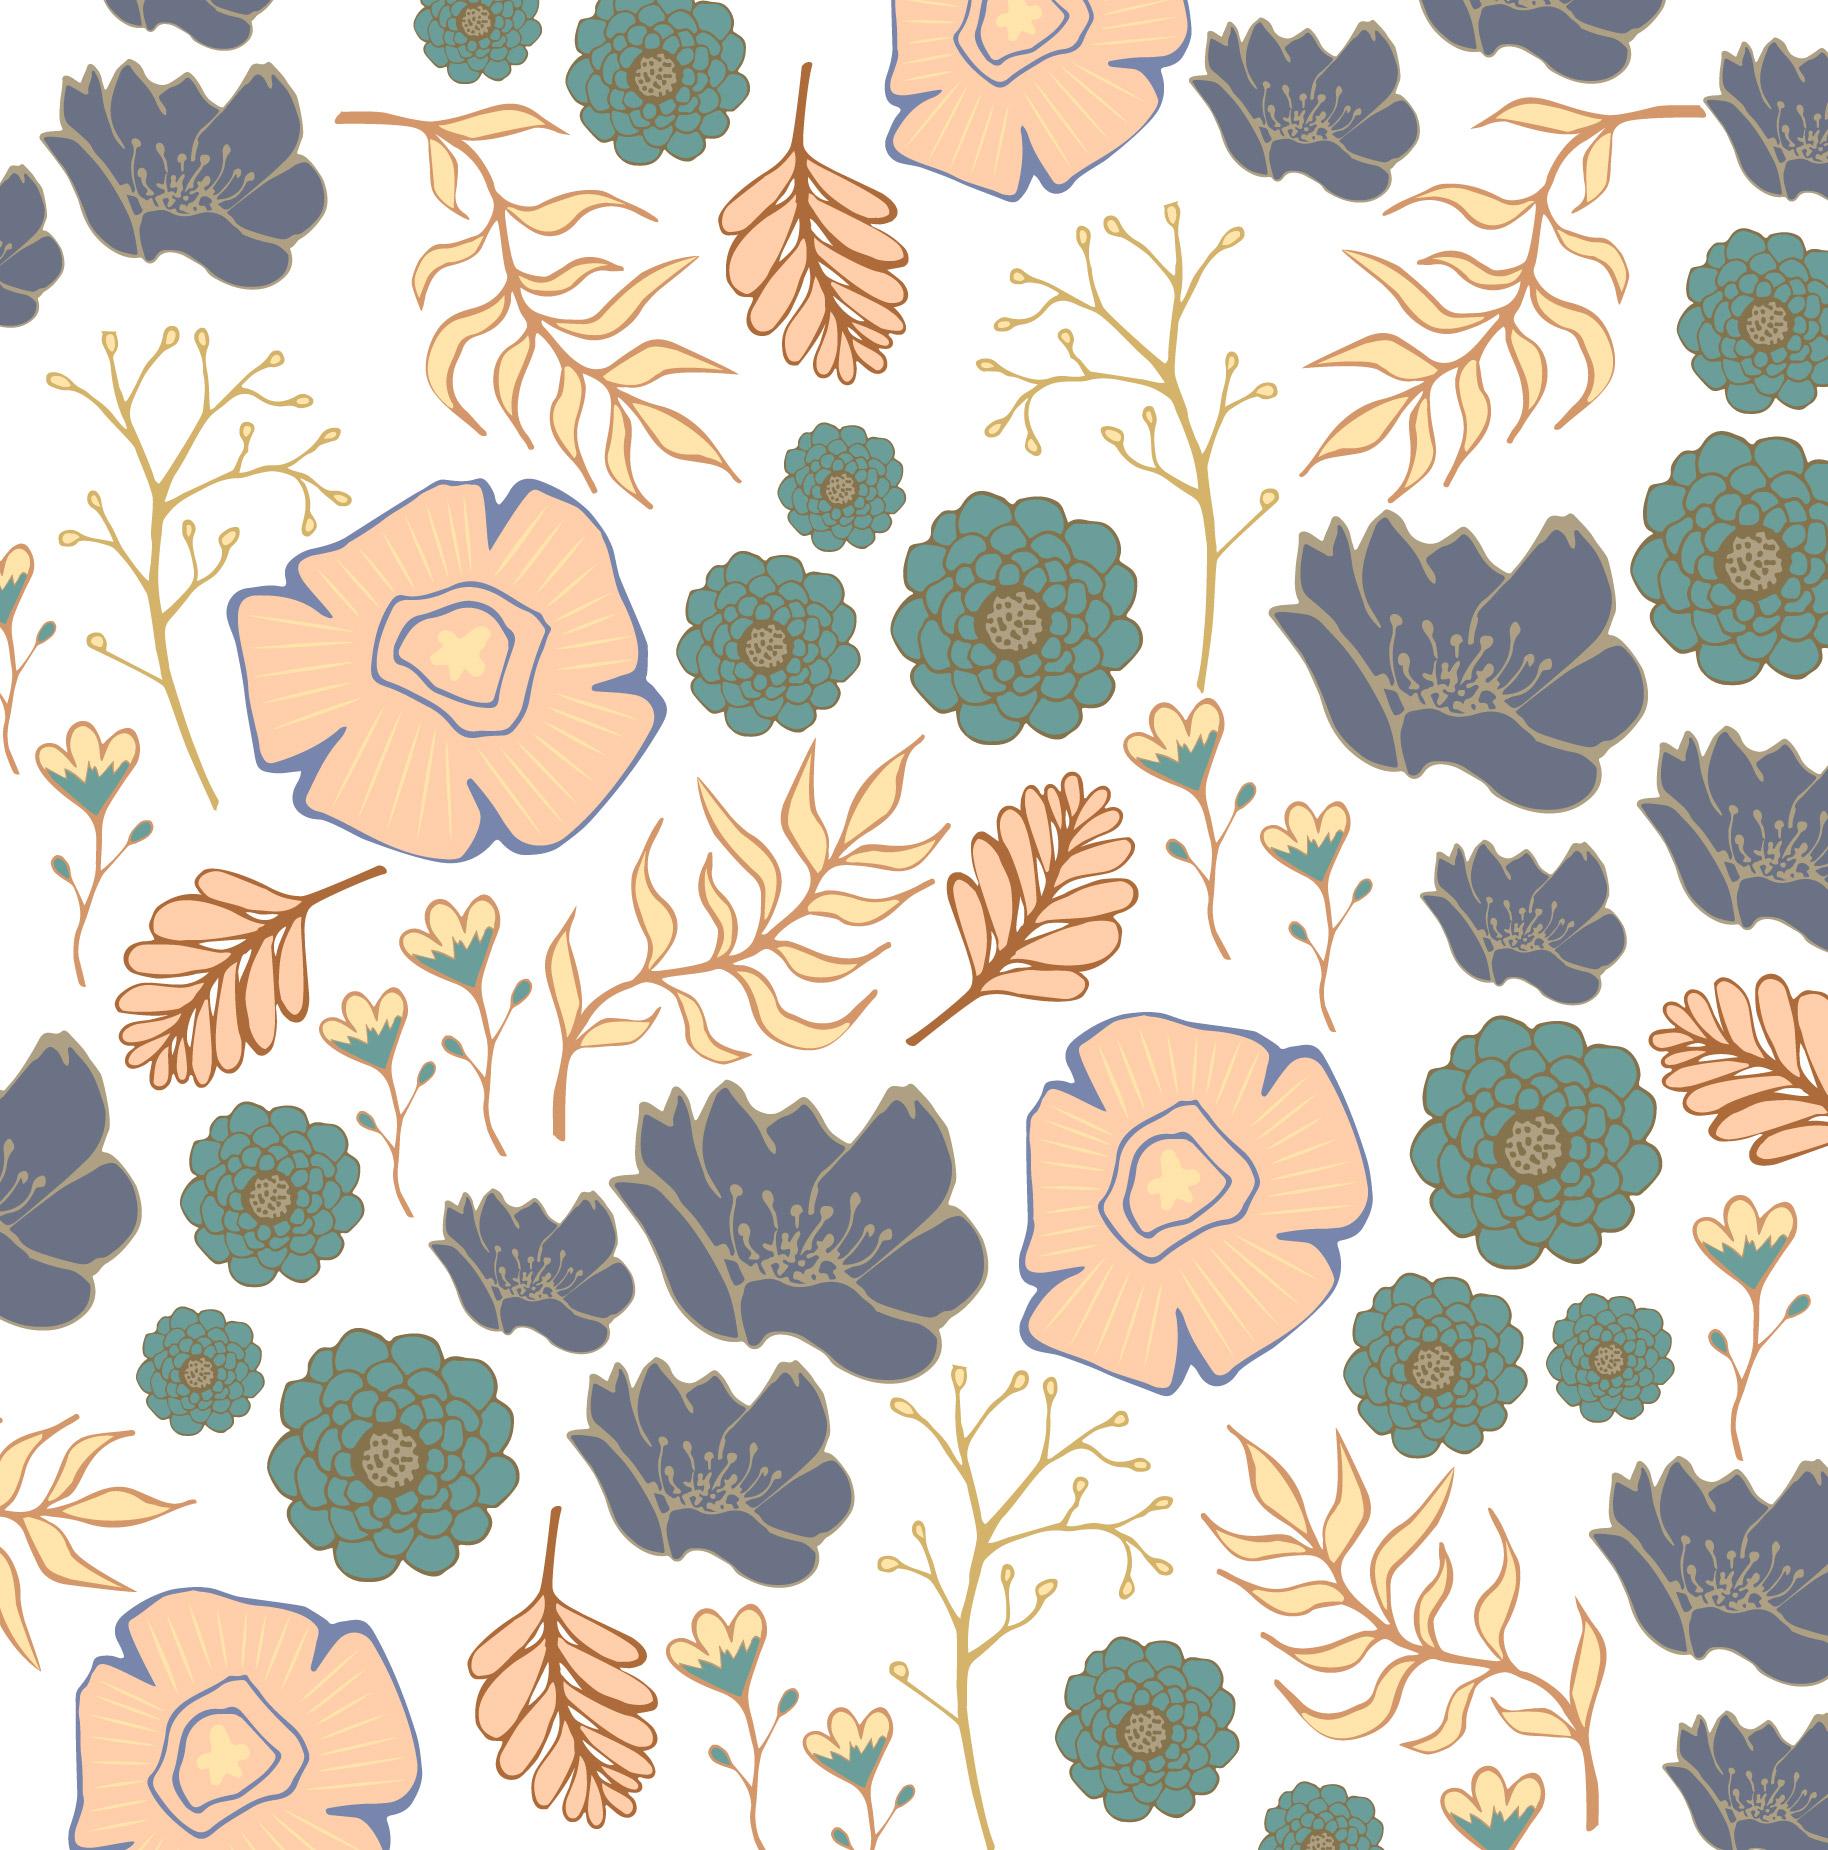 floralpattern-1-04.jpg